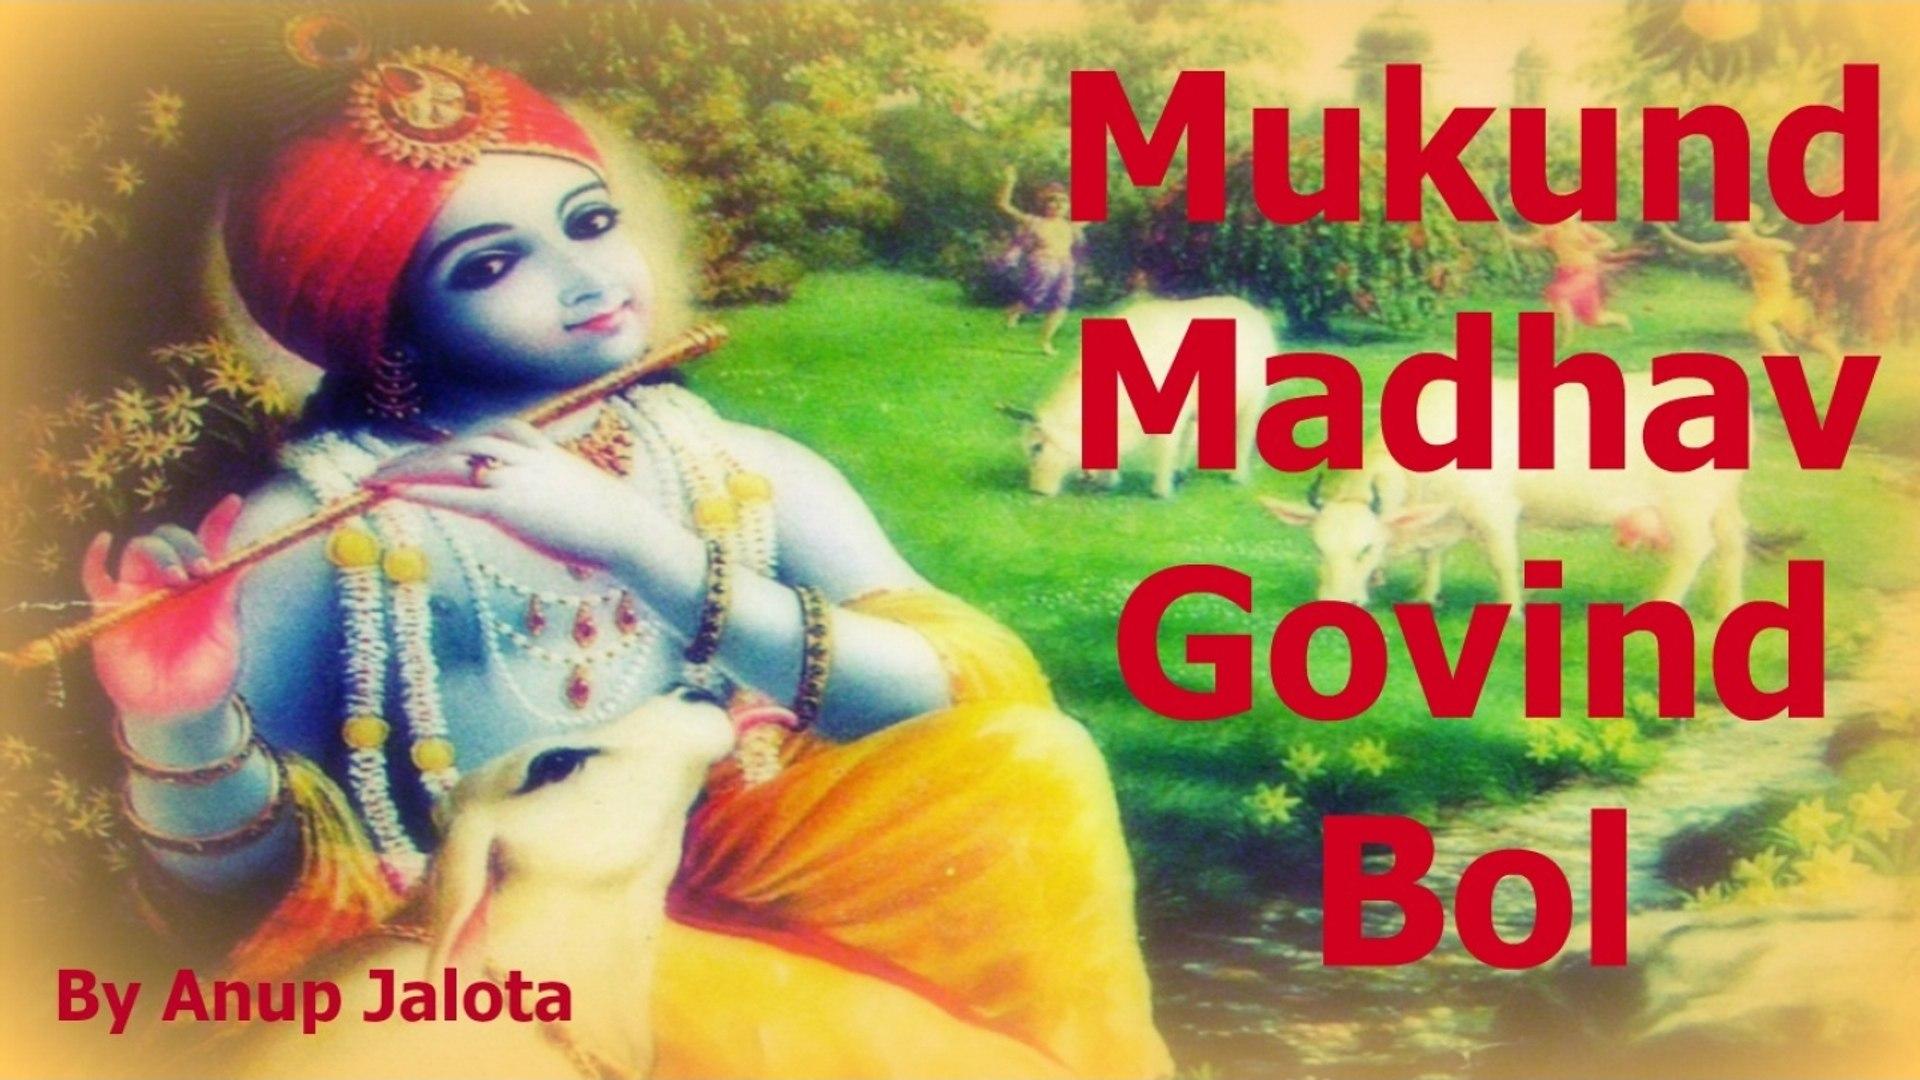 Anup Jalota - Top 10 Bhajans | Mukund Madhav Govind Bol | Vintage Collection